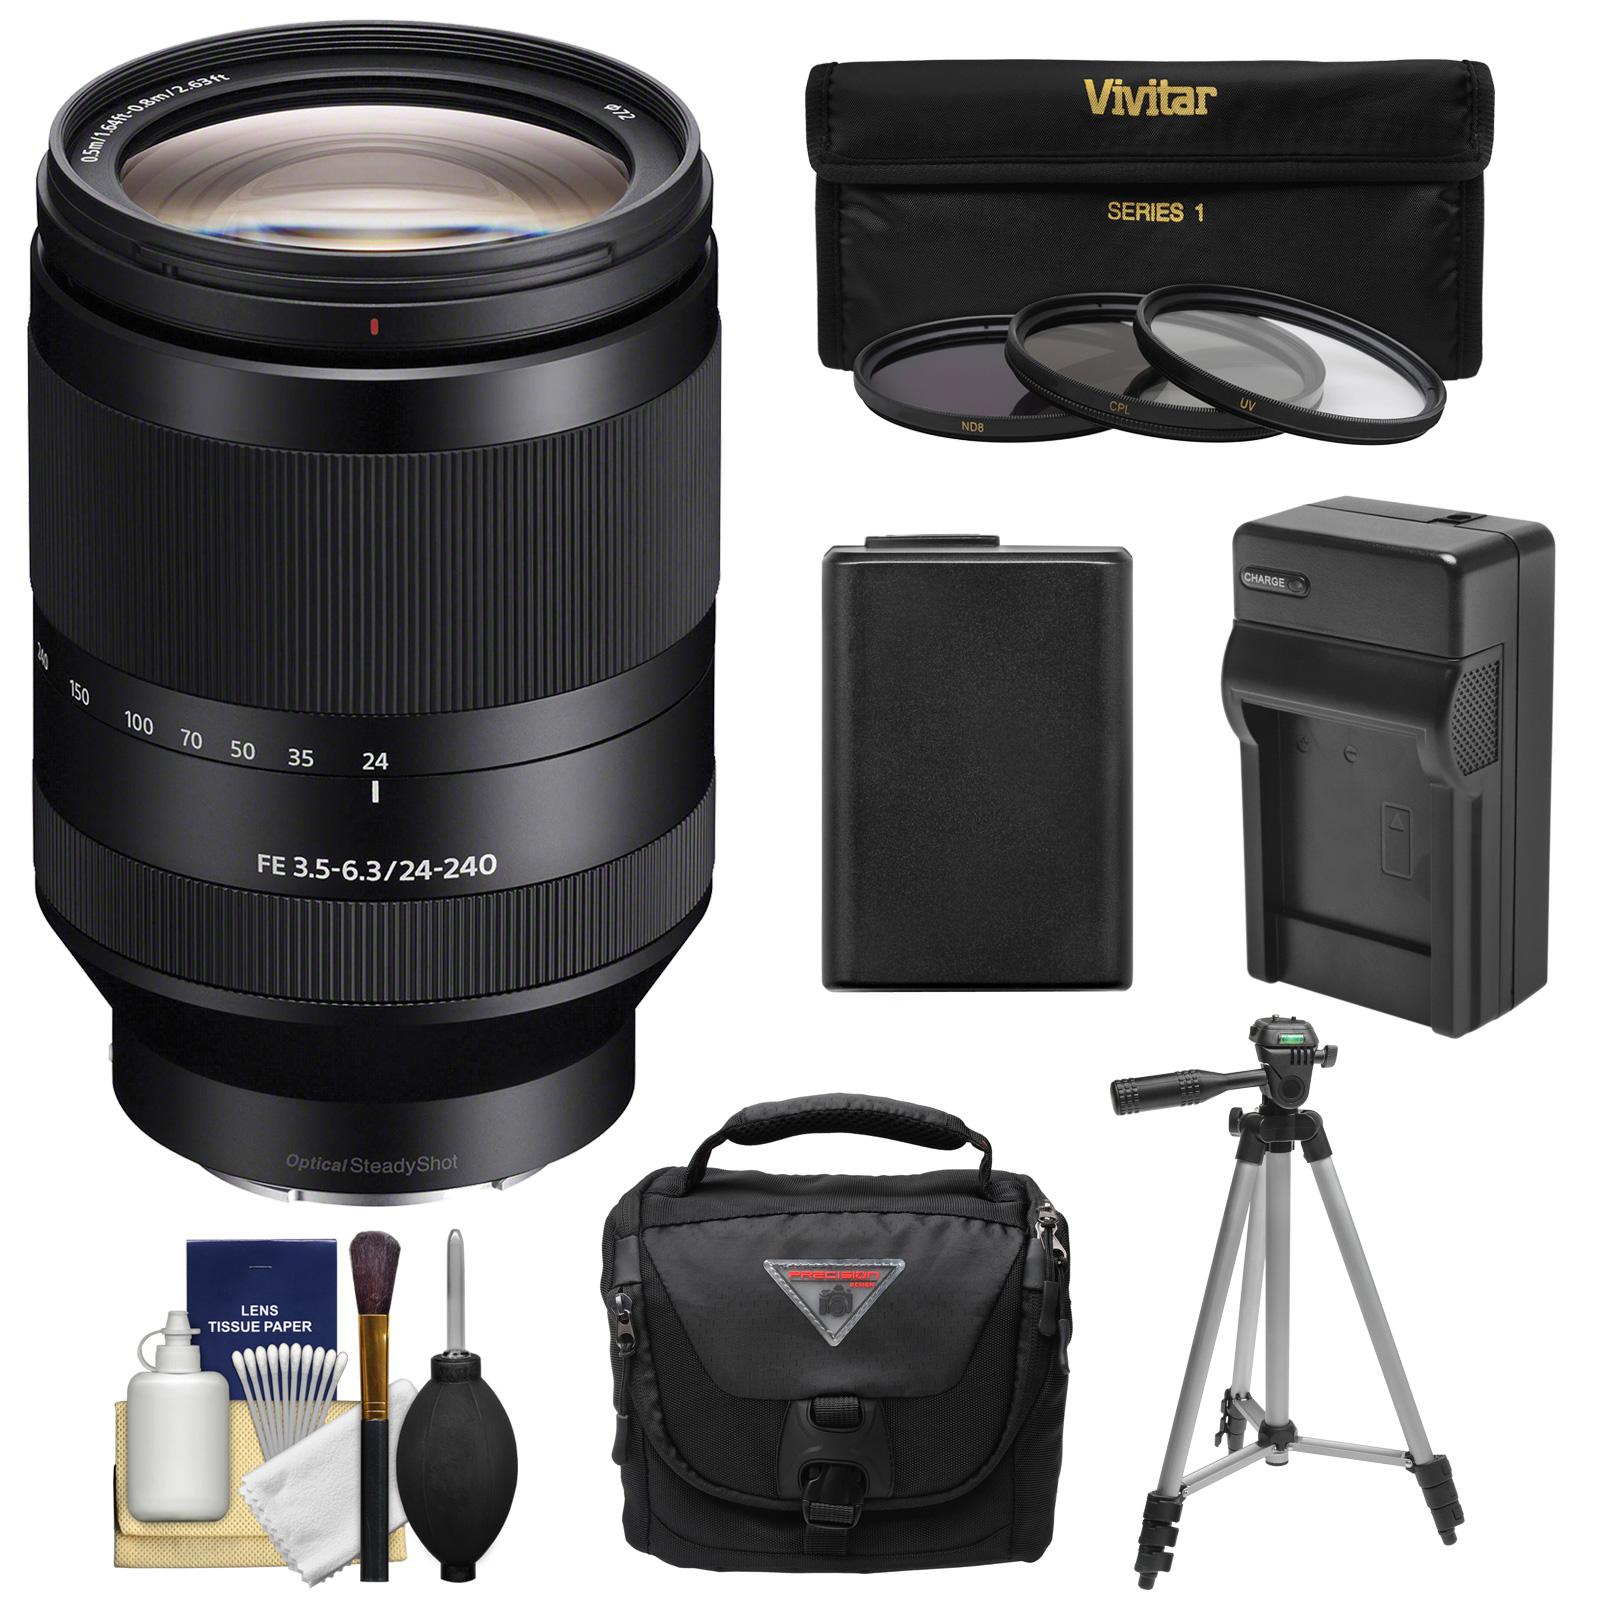 Camara Fotografica Compacta  Sony Alpha montura E FE 24-240mm f/3.5-6.3 lente de zumbido del OSS 3 filtros UV/CPL/ND8 + batería + cargador + caja + Kit de trípode para A7, A7R, A7S Mark II cámaras + Sony en Veo y Compro